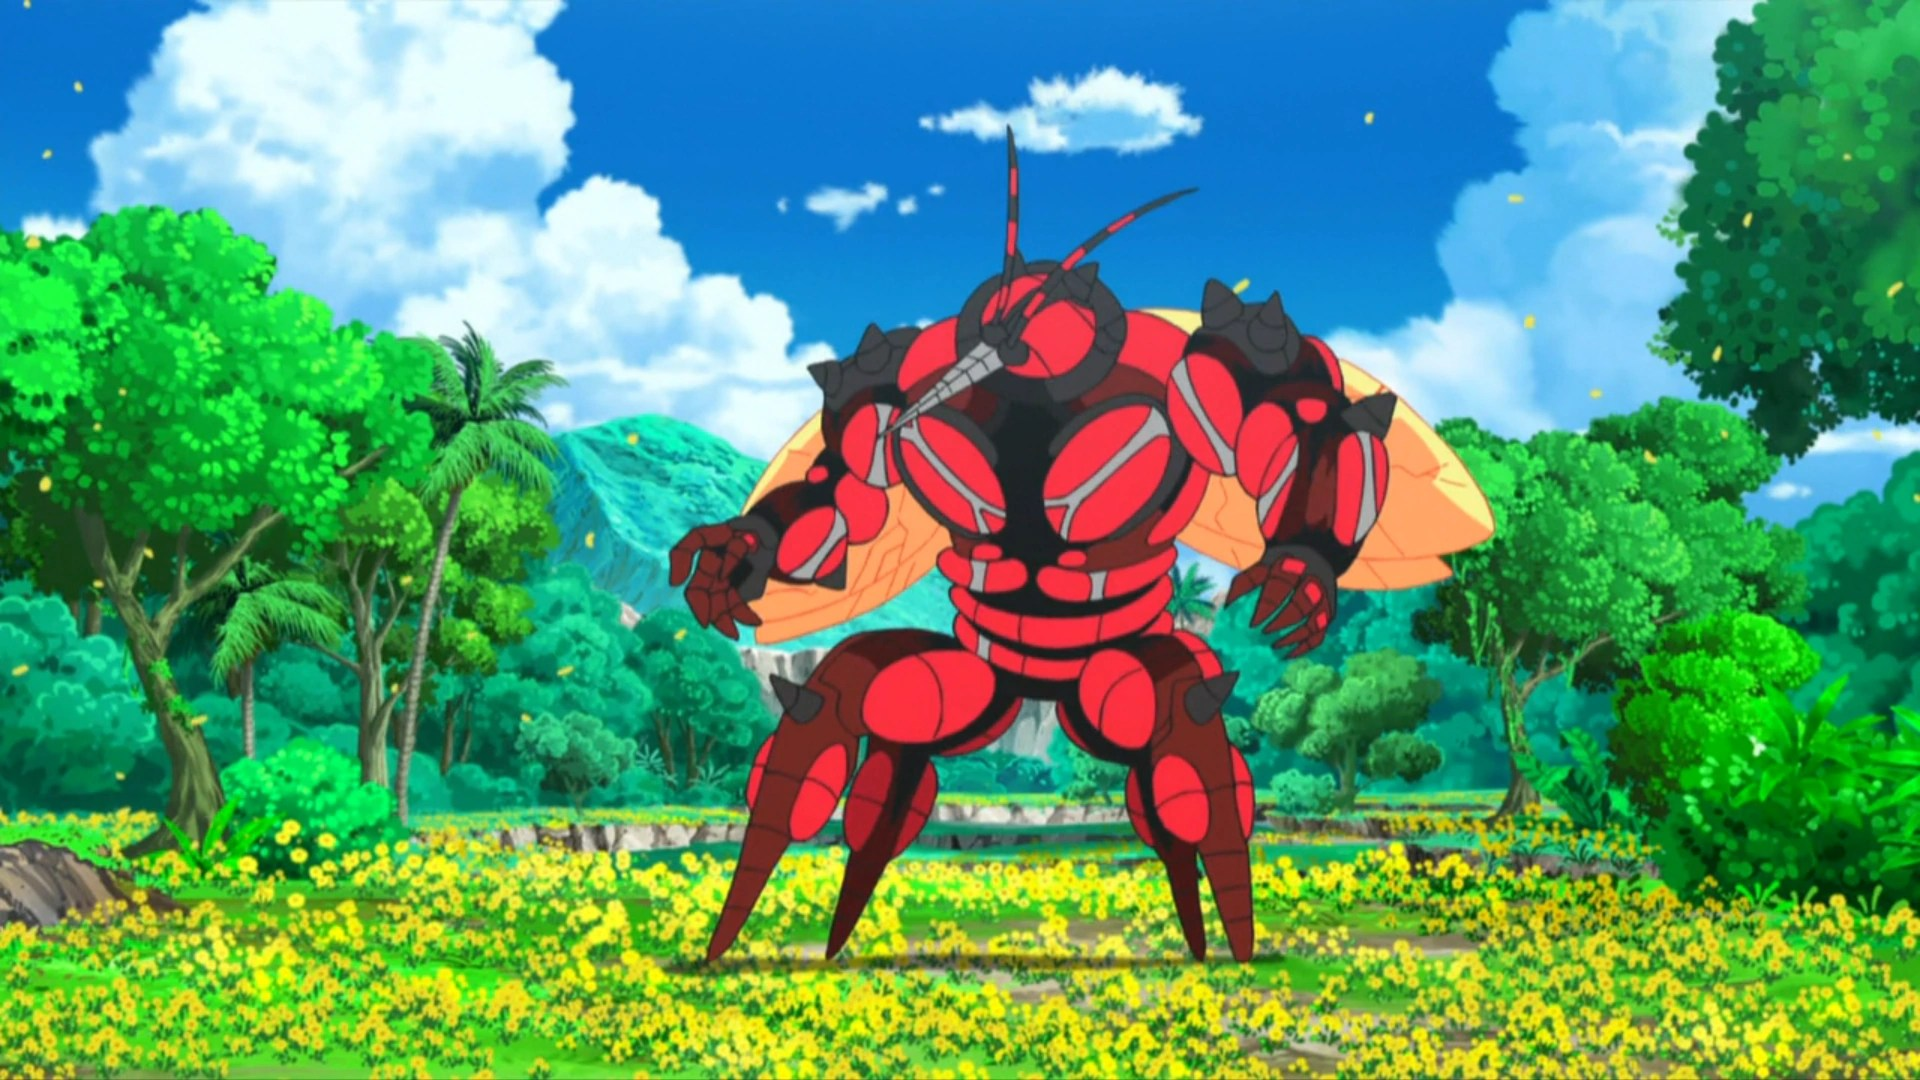 Anime Wallpaper Cool Buzzwole Anime Pok 233 Mon Wiki Fandom Powered By Wikia